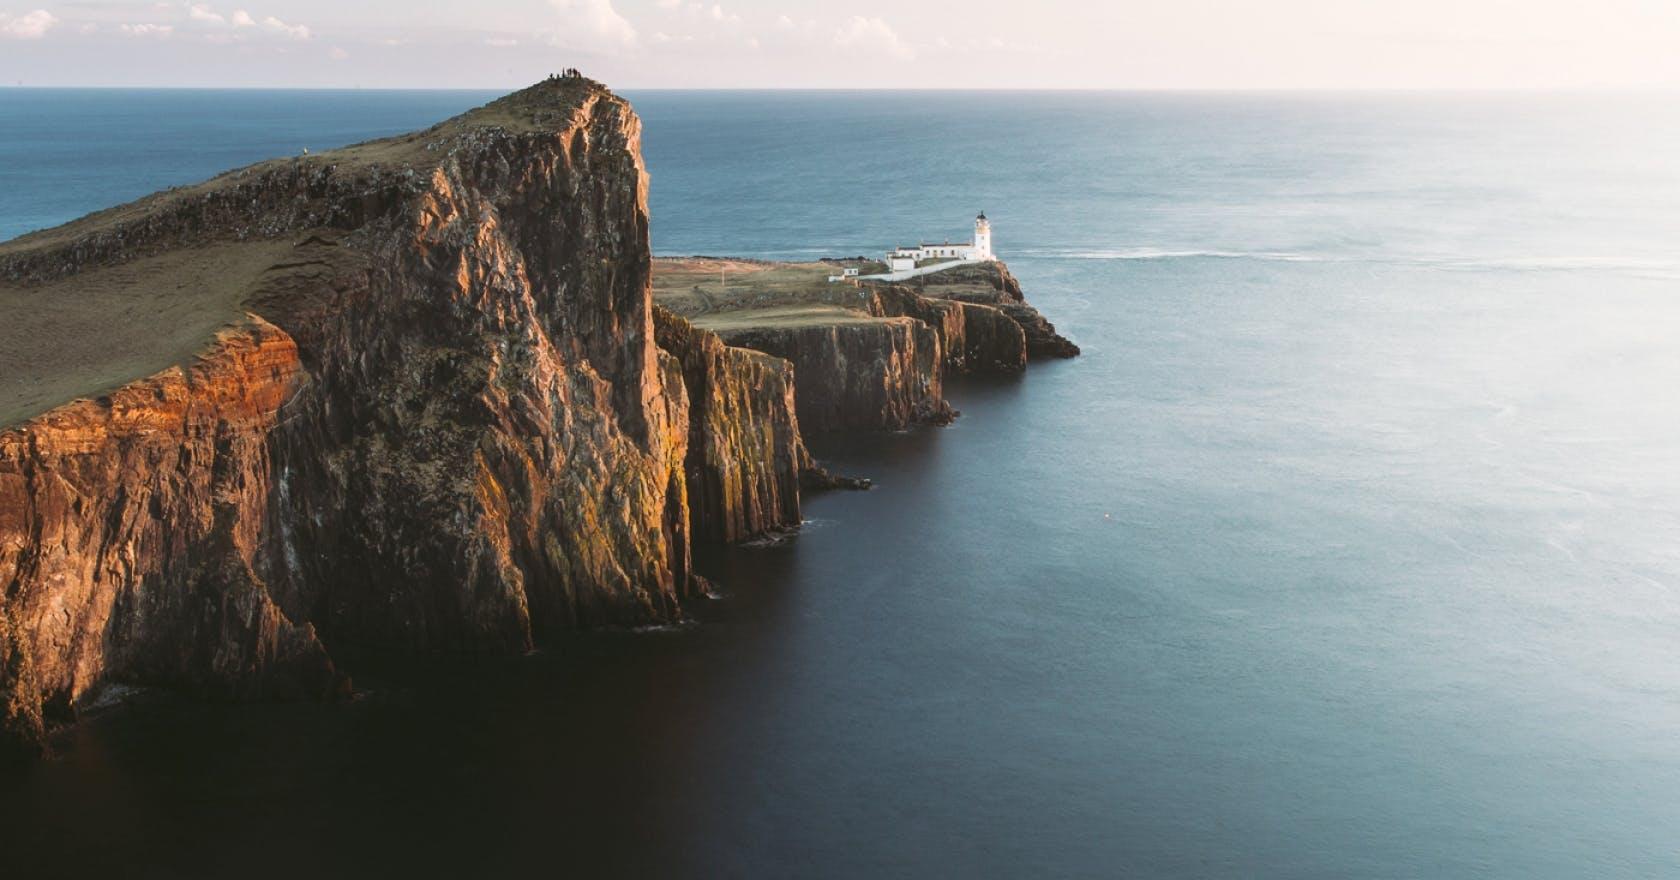 A celebration of Scotland and its beautifully wild landscape